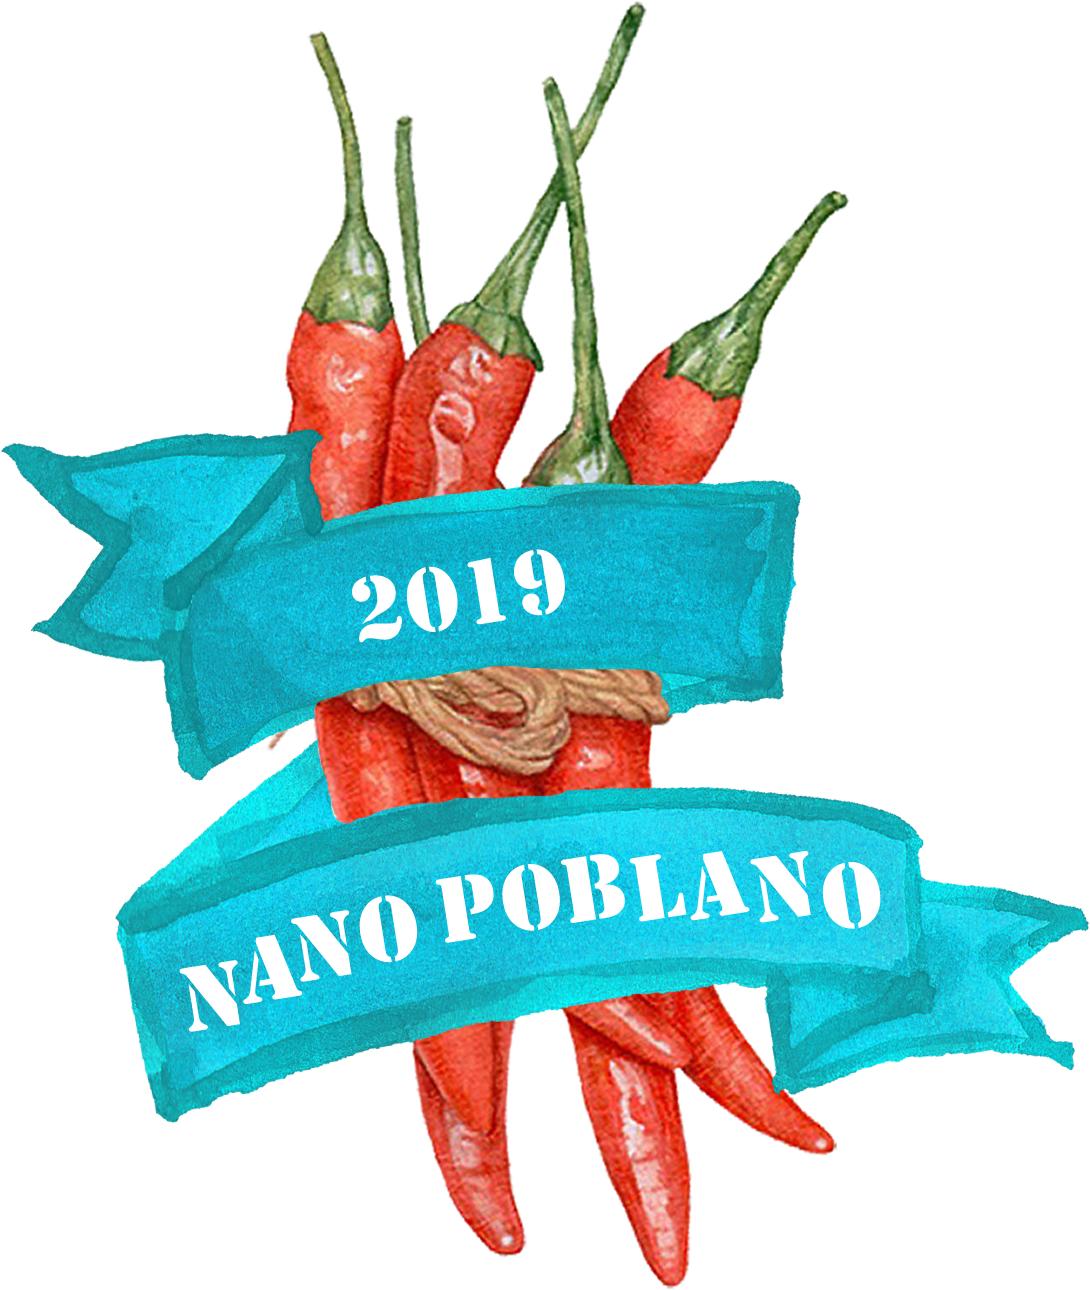 nano-poblano-2019